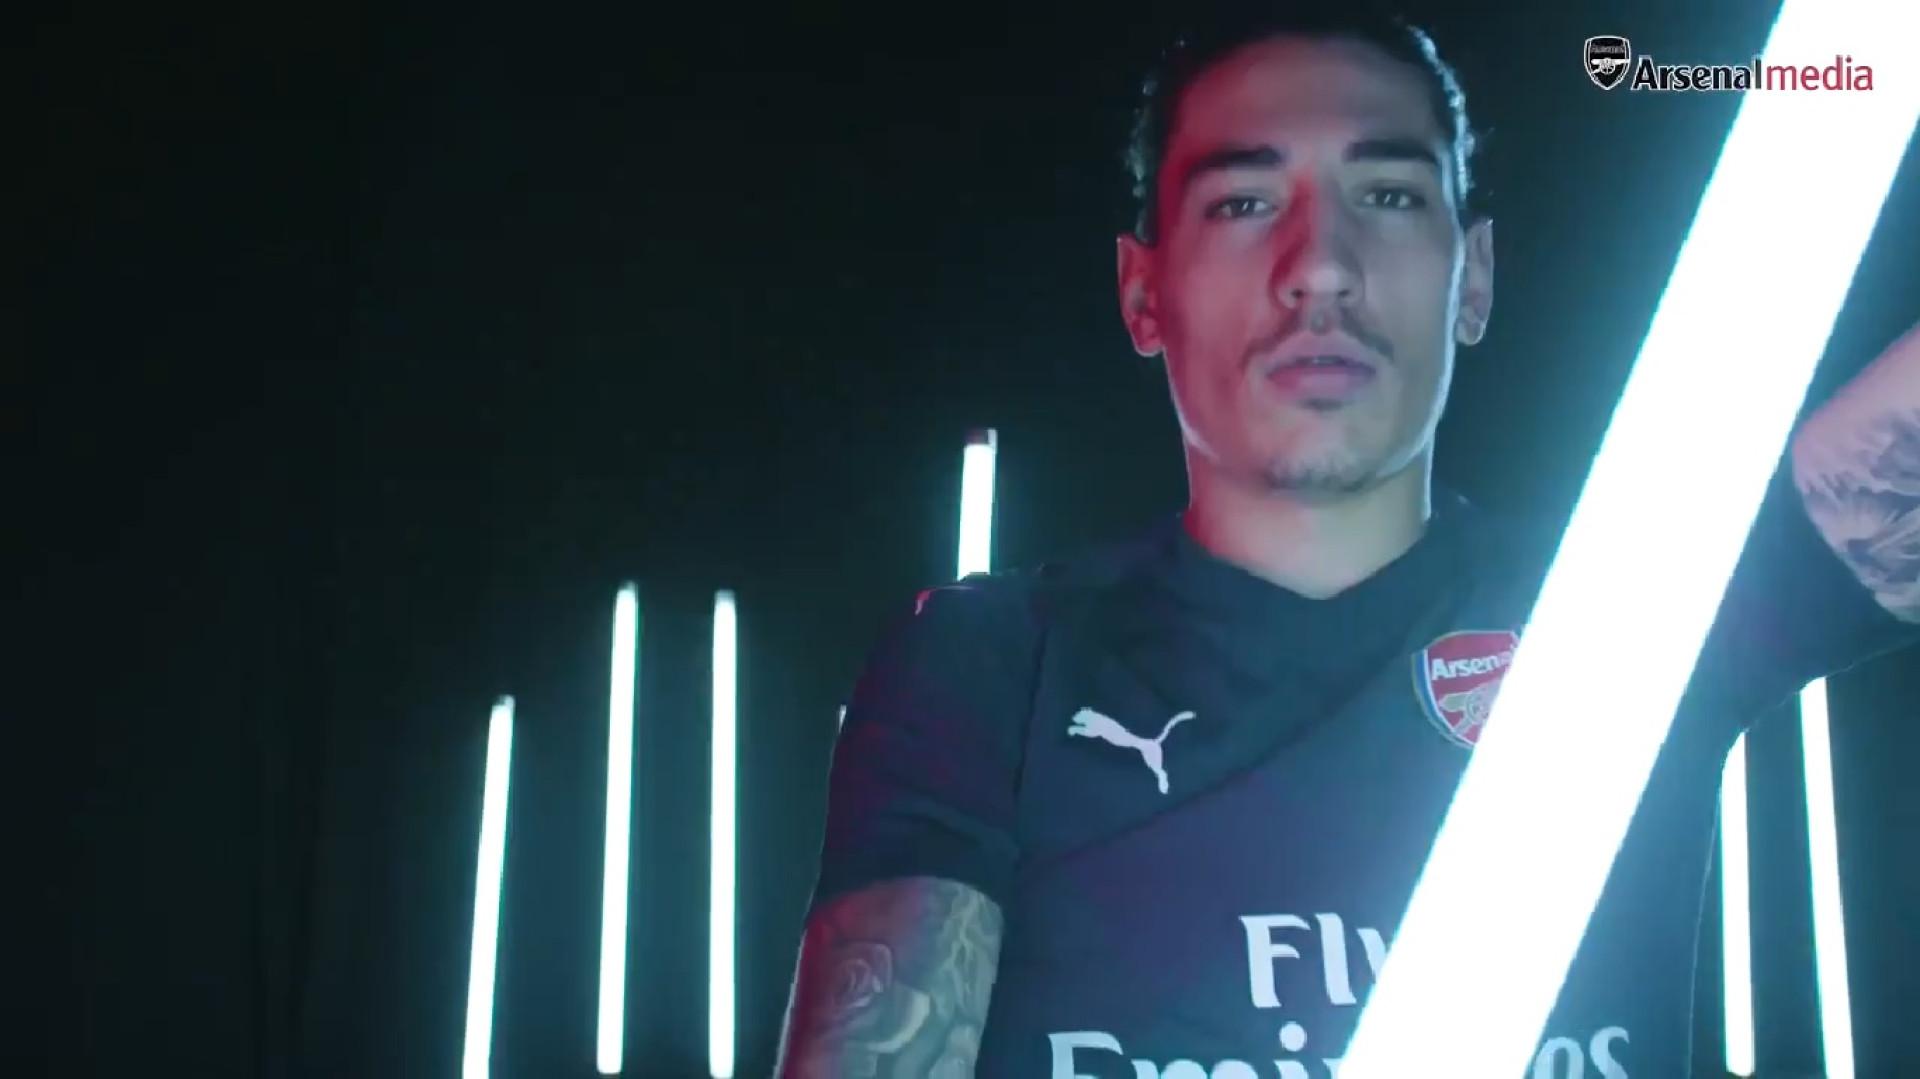 Arsenal divulga equipamento alternativo nas redes sociais